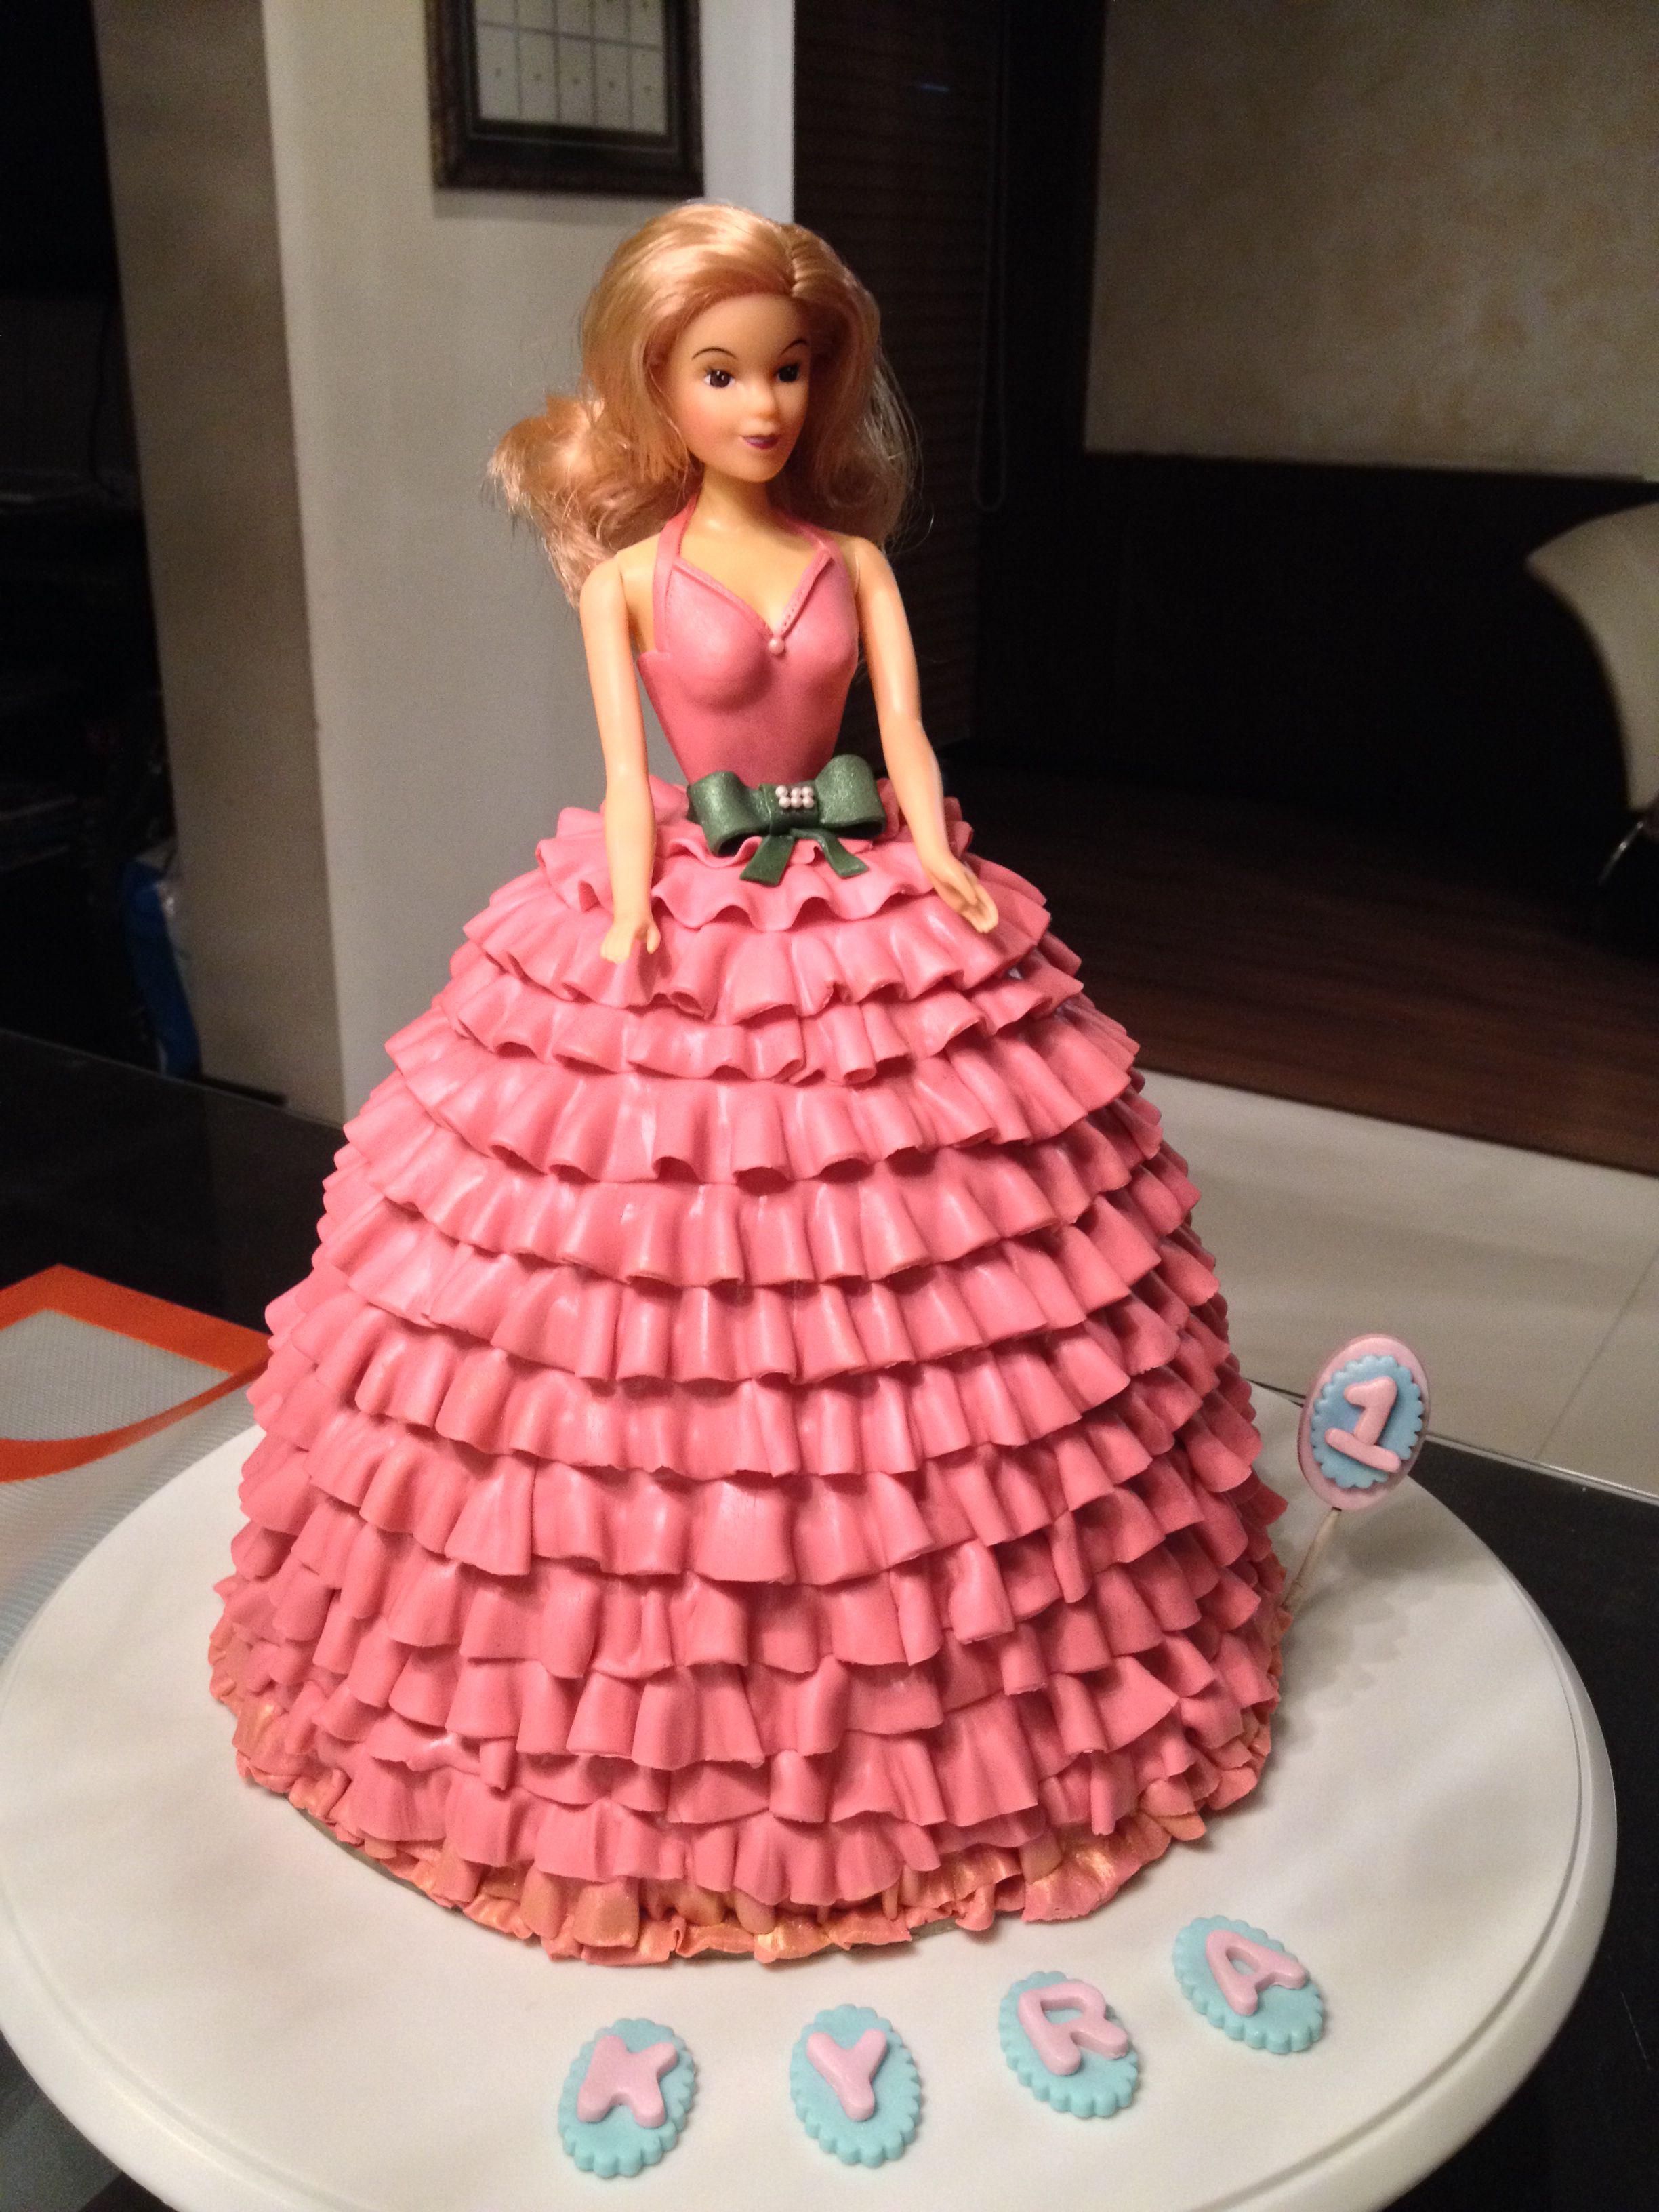 Doll cake. Seven layered chocolate cake with fondant ruffles...